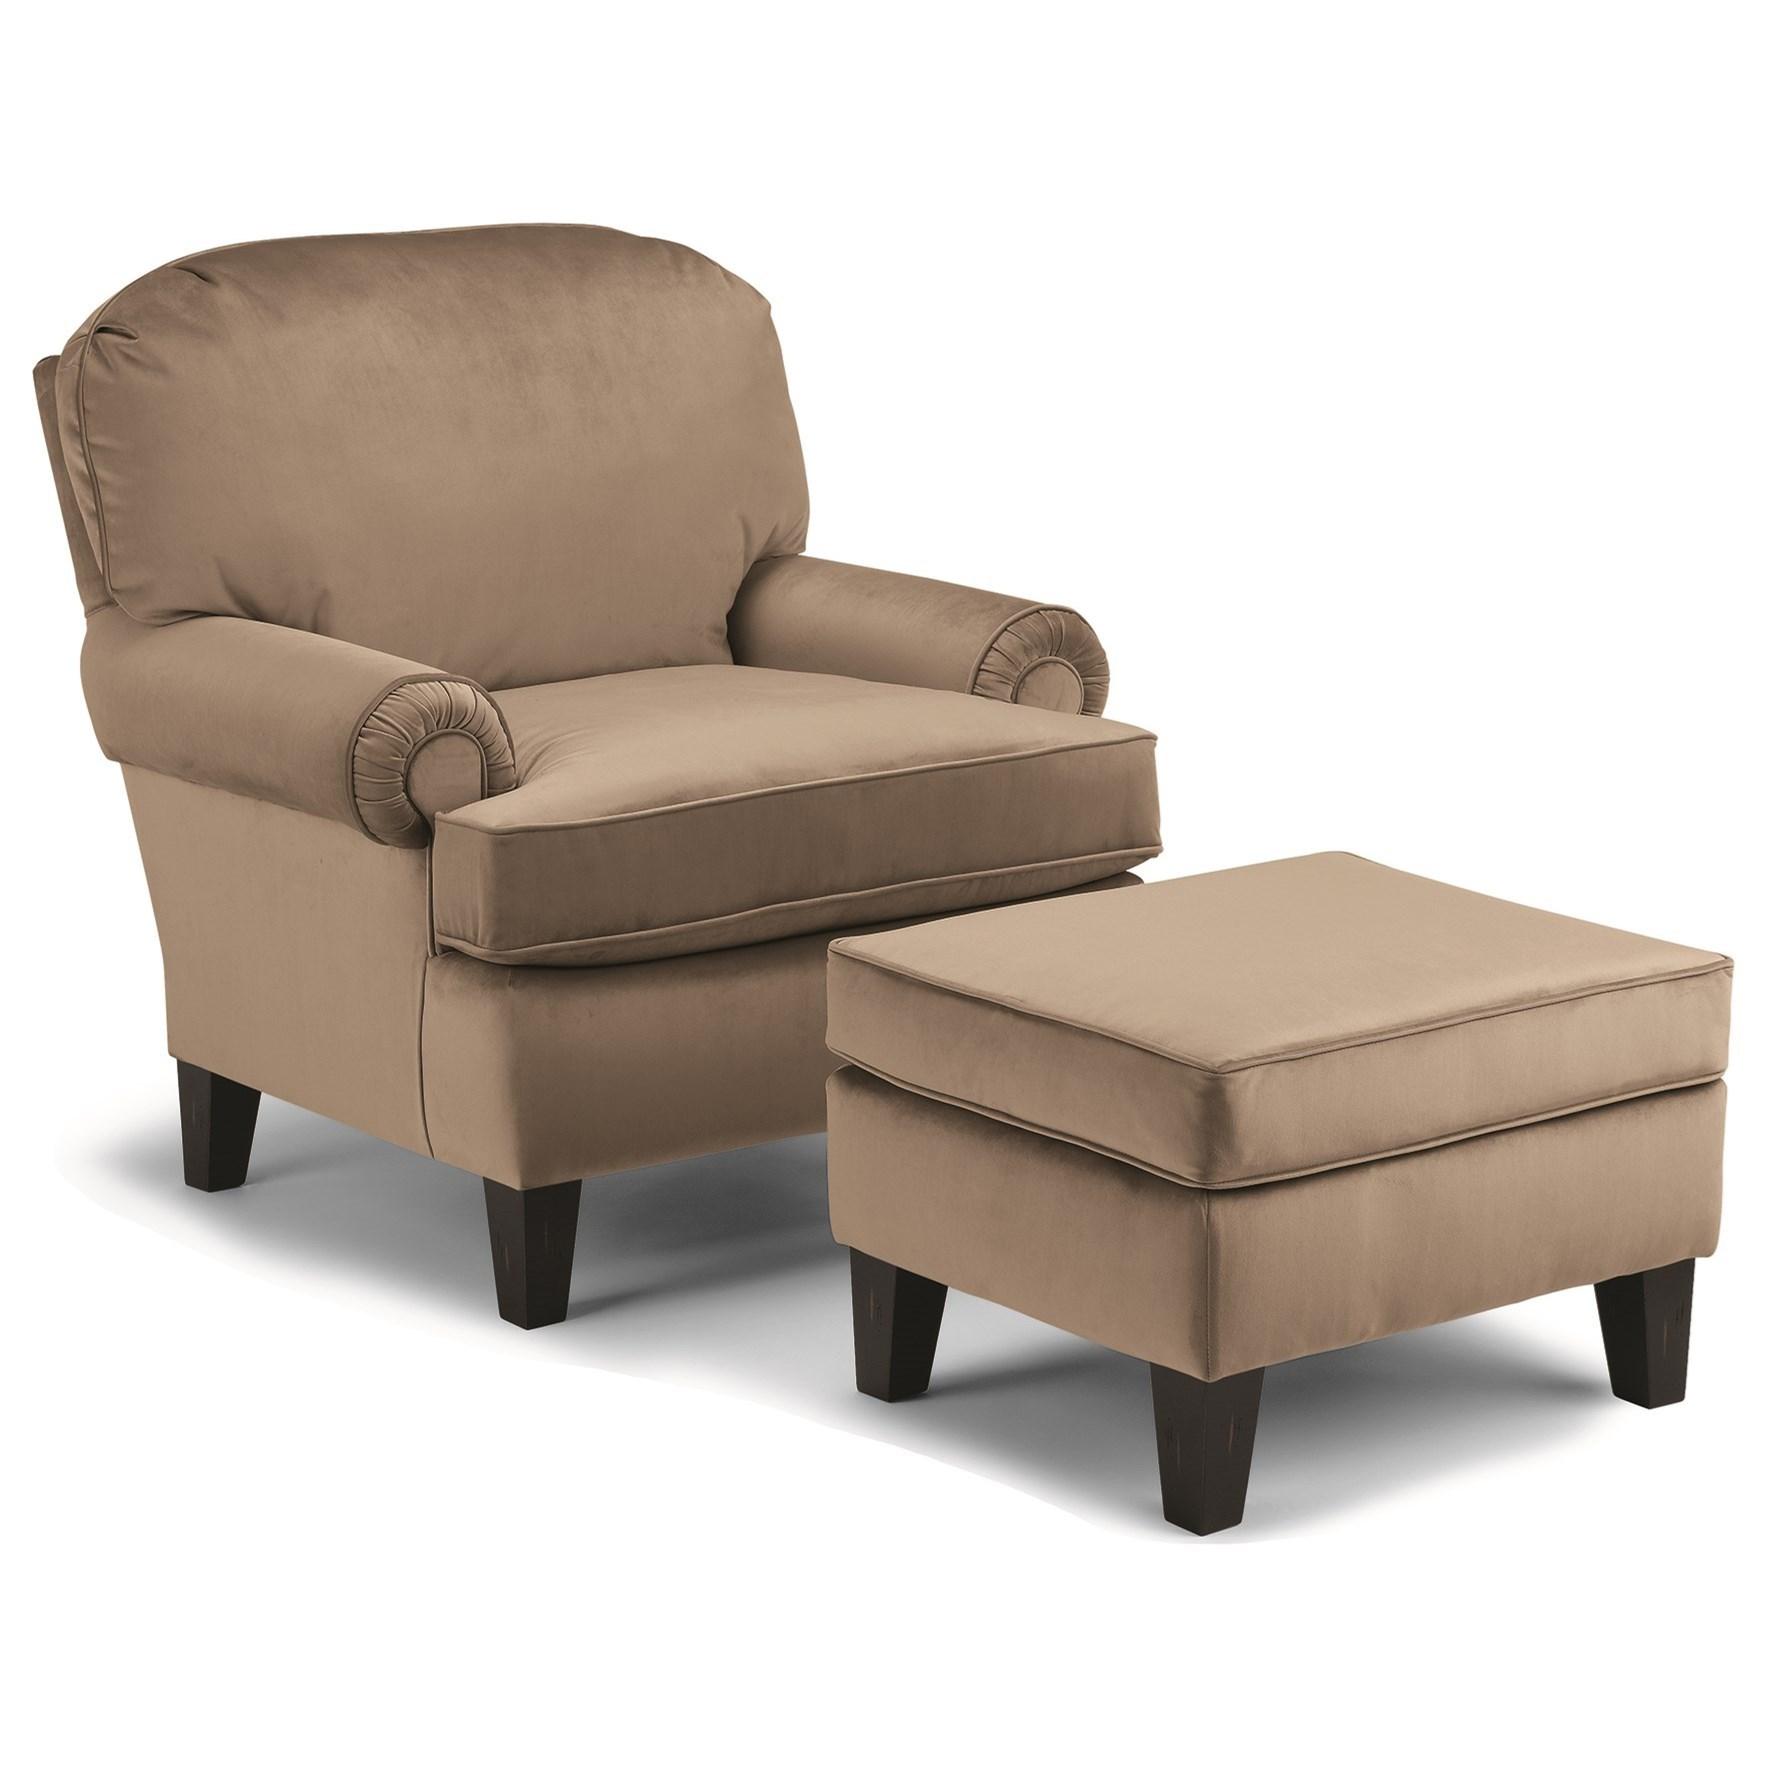 Best Home Furnishings Club Chairs Ottoman